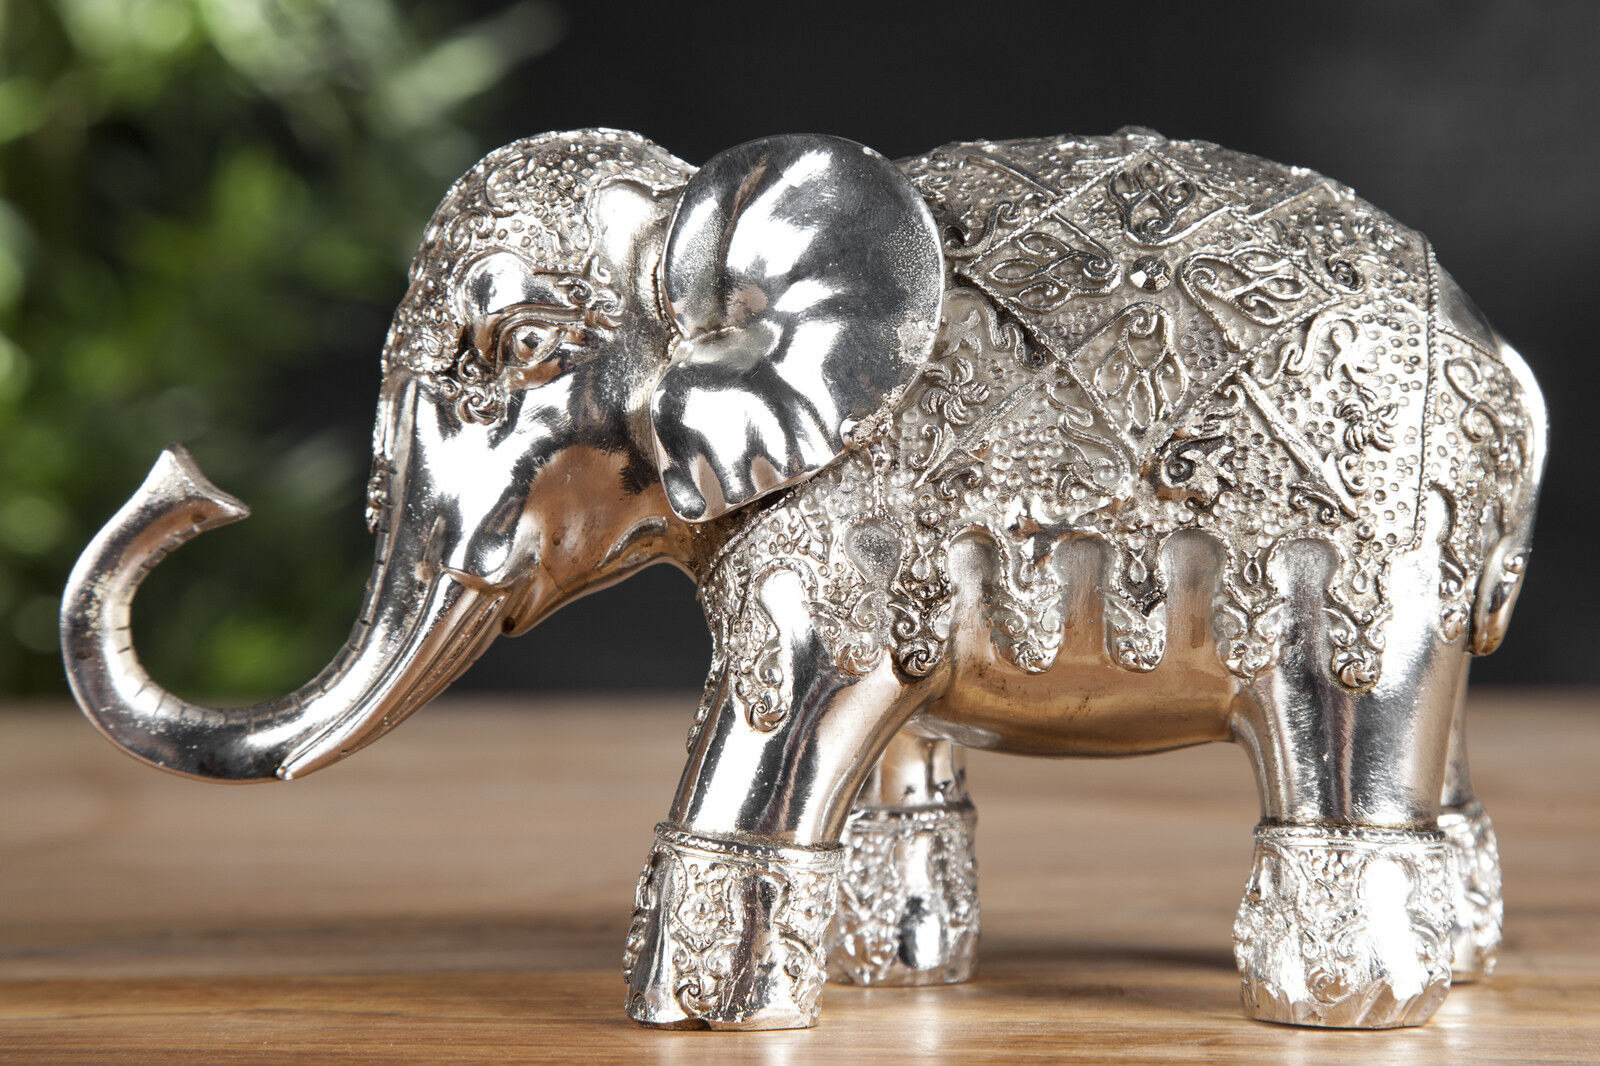 deko skulptur elefant in silber gr e 13cm x 7cm x 22cm hxbxt neu eur 14 90 picclick de. Black Bedroom Furniture Sets. Home Design Ideas